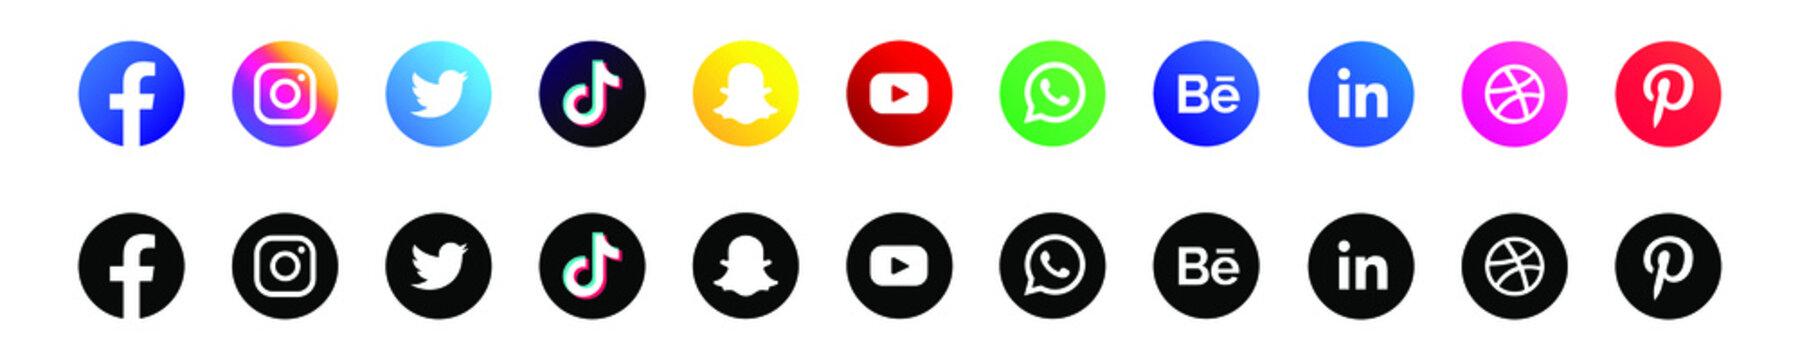 Facebook, twitter, instagram, youtube, snapchat, pinterest, whatsap, linkedin, periscope, vimeo - Collection of popular social media logo. Social media icons. Realistic set. Vector editorial